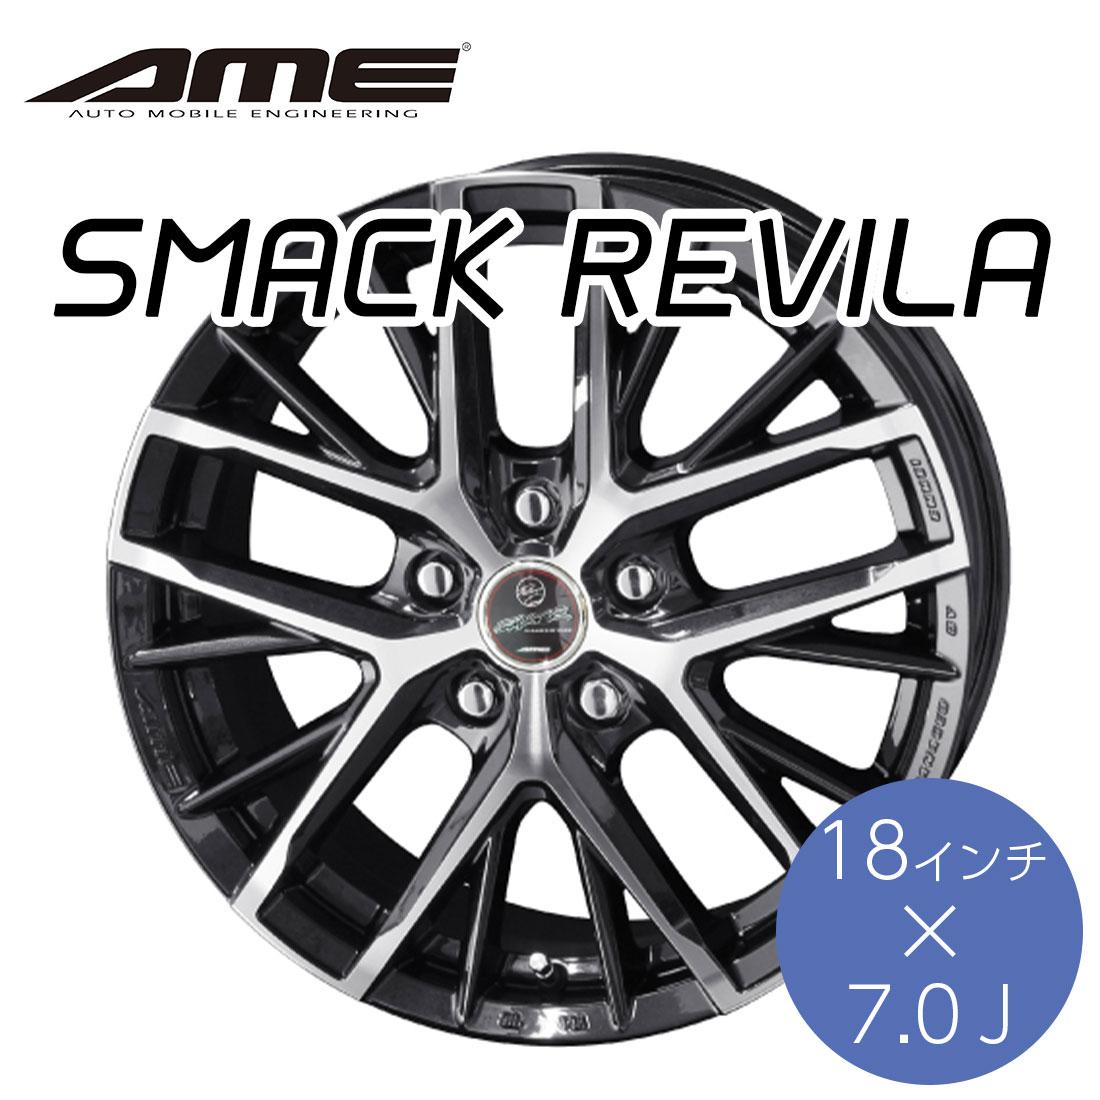 KYOHO ホイール スマック レヴィラ 18×7.0J インチ 5H PCD 100 114.3 SMACK REVILA by AME 共豊 サファイアブラック×ポリッシュ かっこいい 車